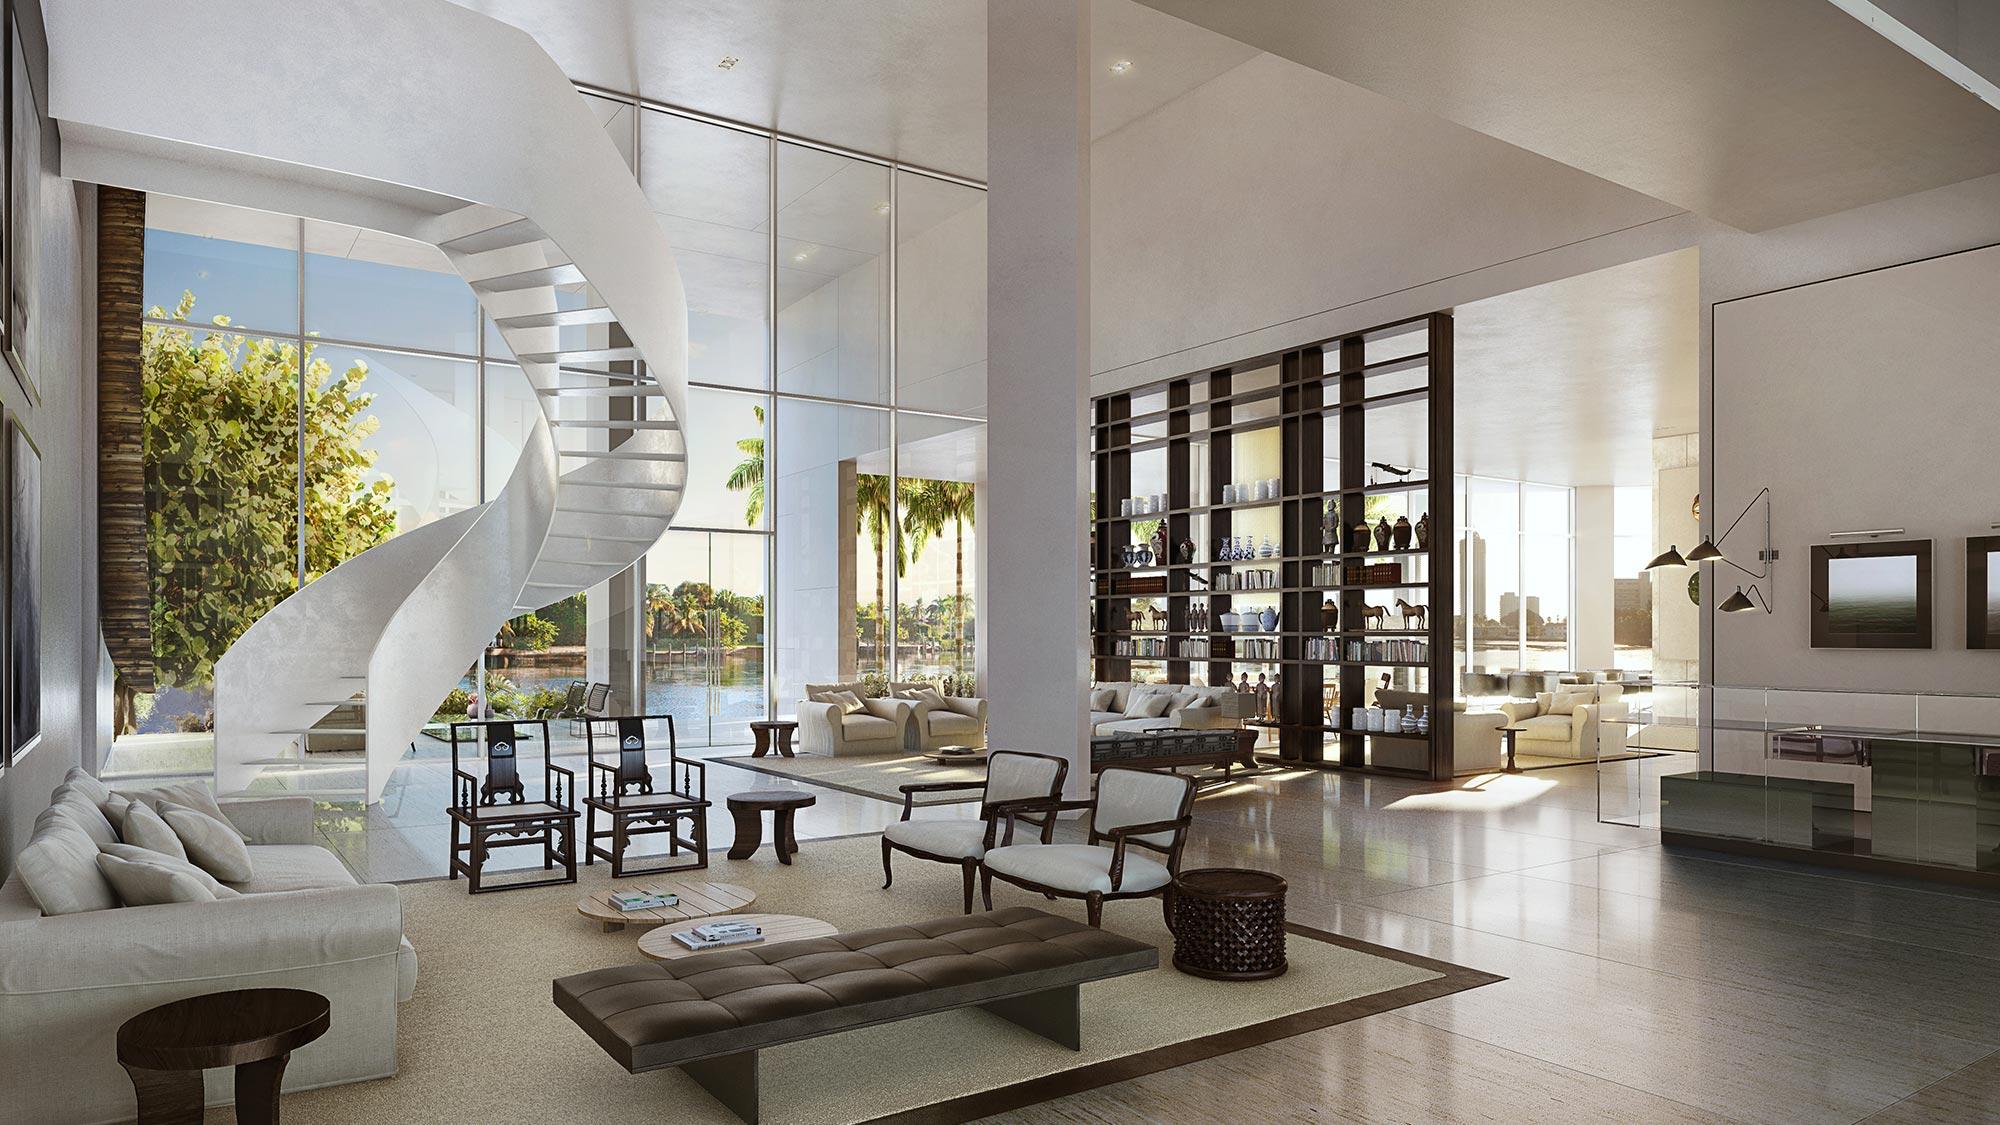 Grand Lobby at the new homes in Miami at The Ritz-Carlton Residences, Miami Beach